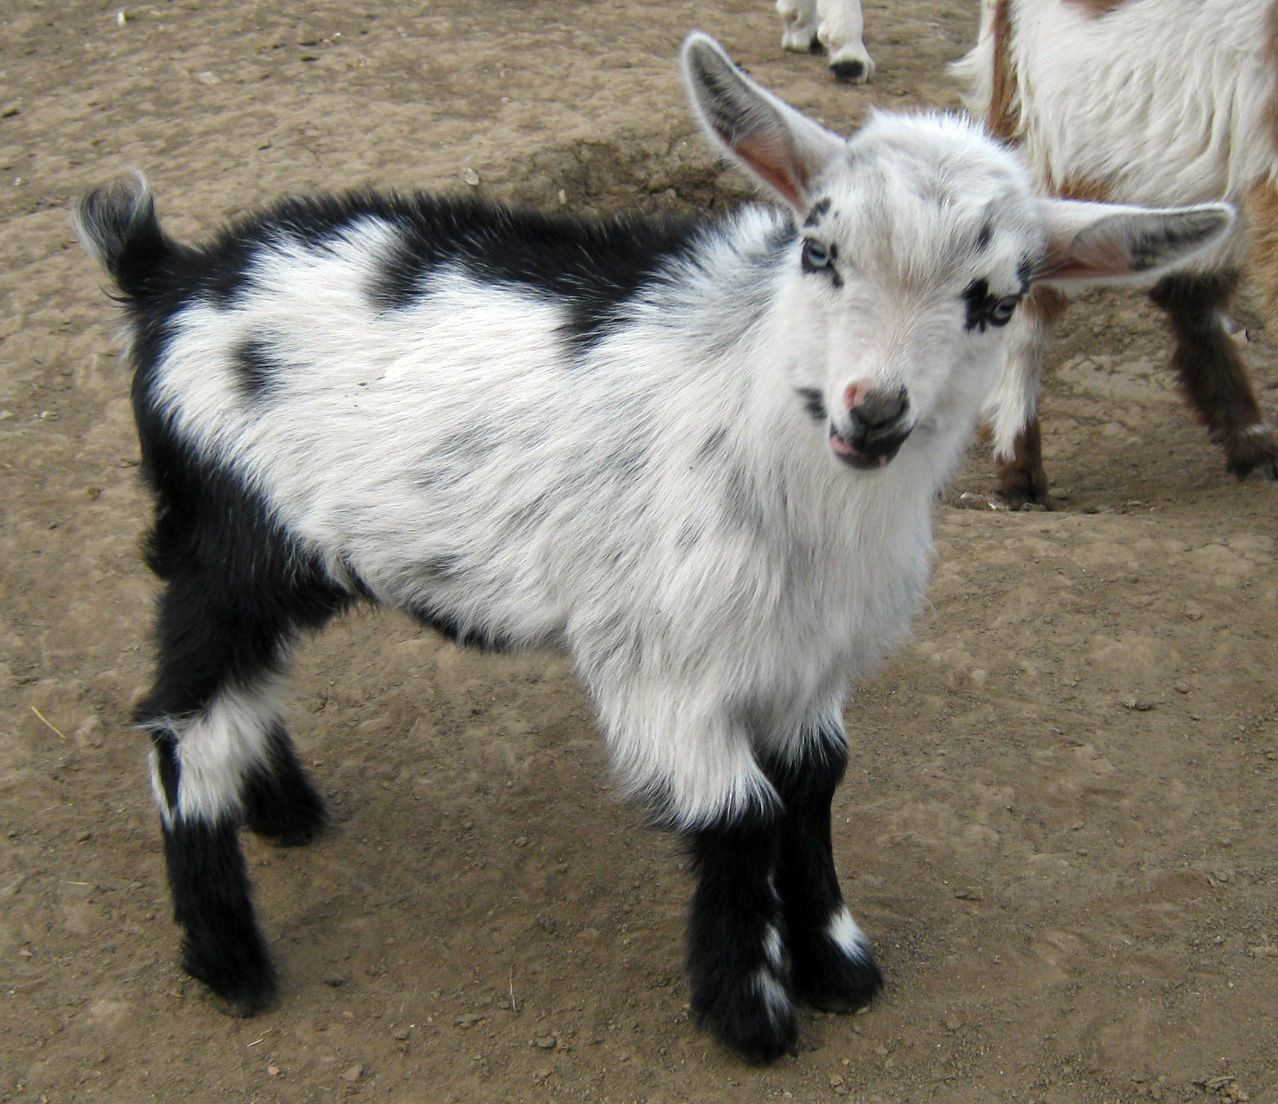 Registered Nigerian Dwarf Goats - Does